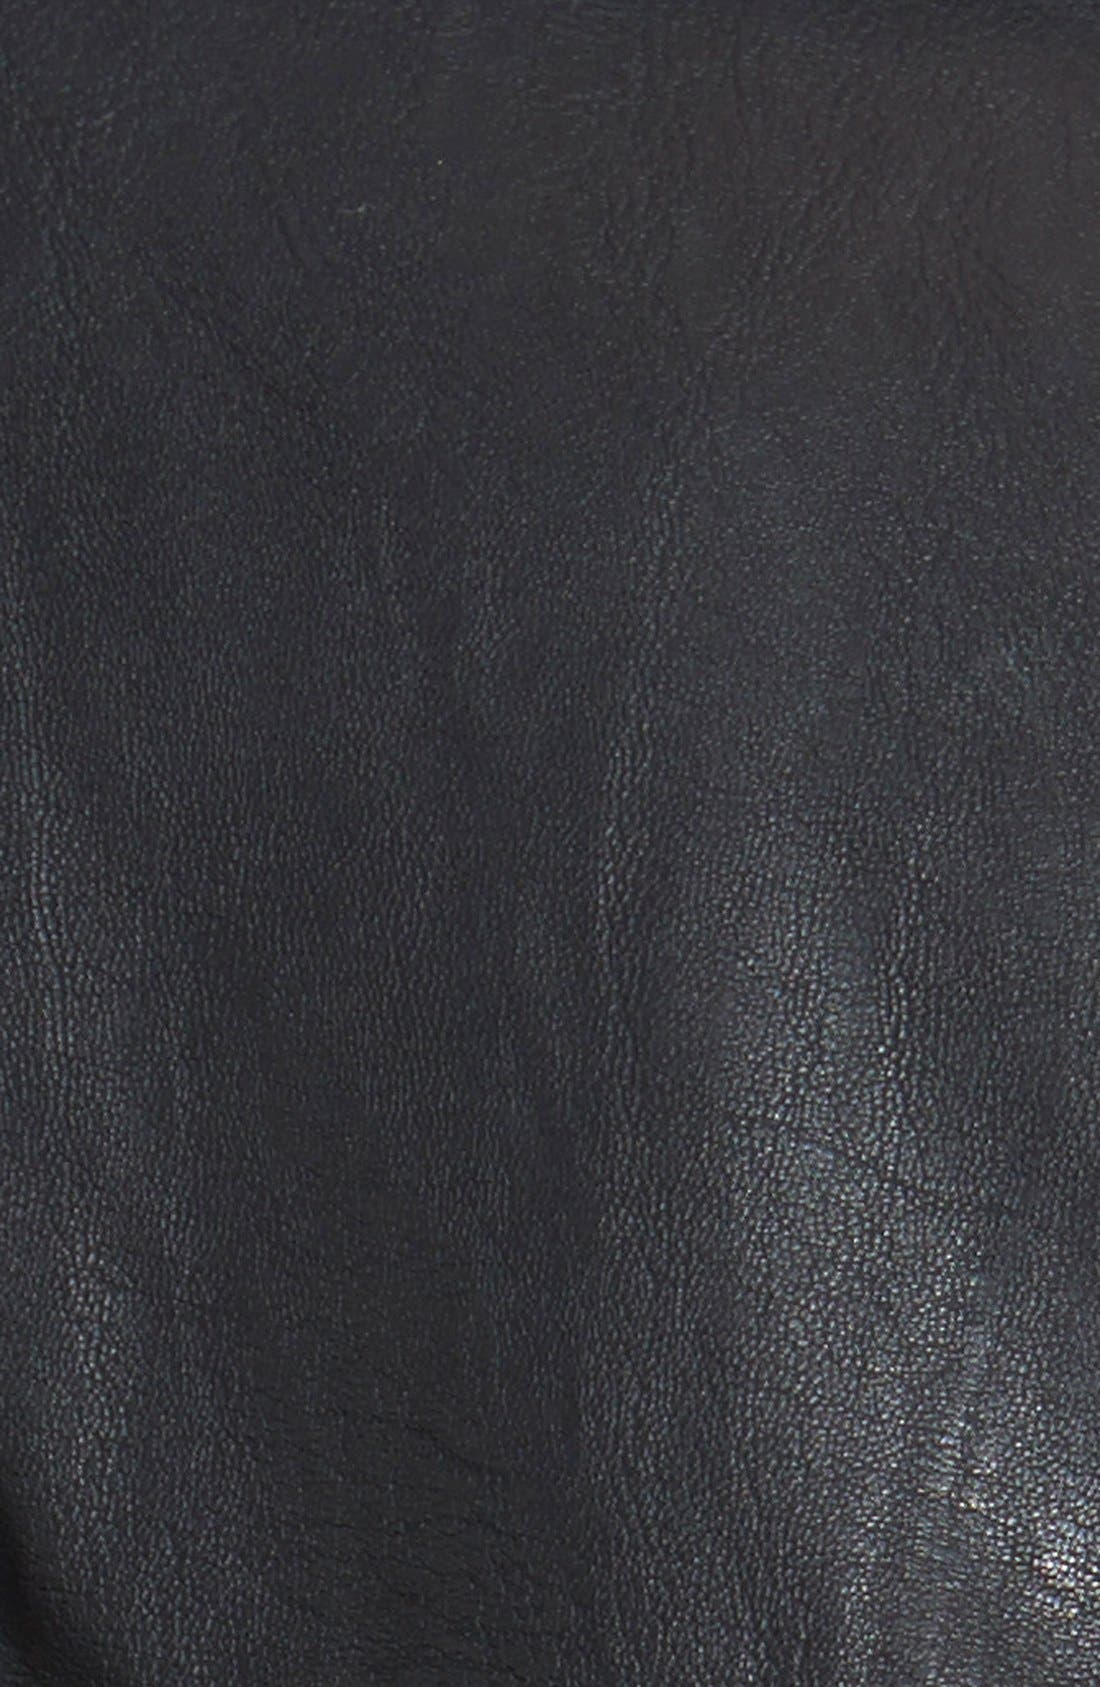 Alternate Image 3  - BLANKNYC 'Let It Ride' Faux Leather Jacket